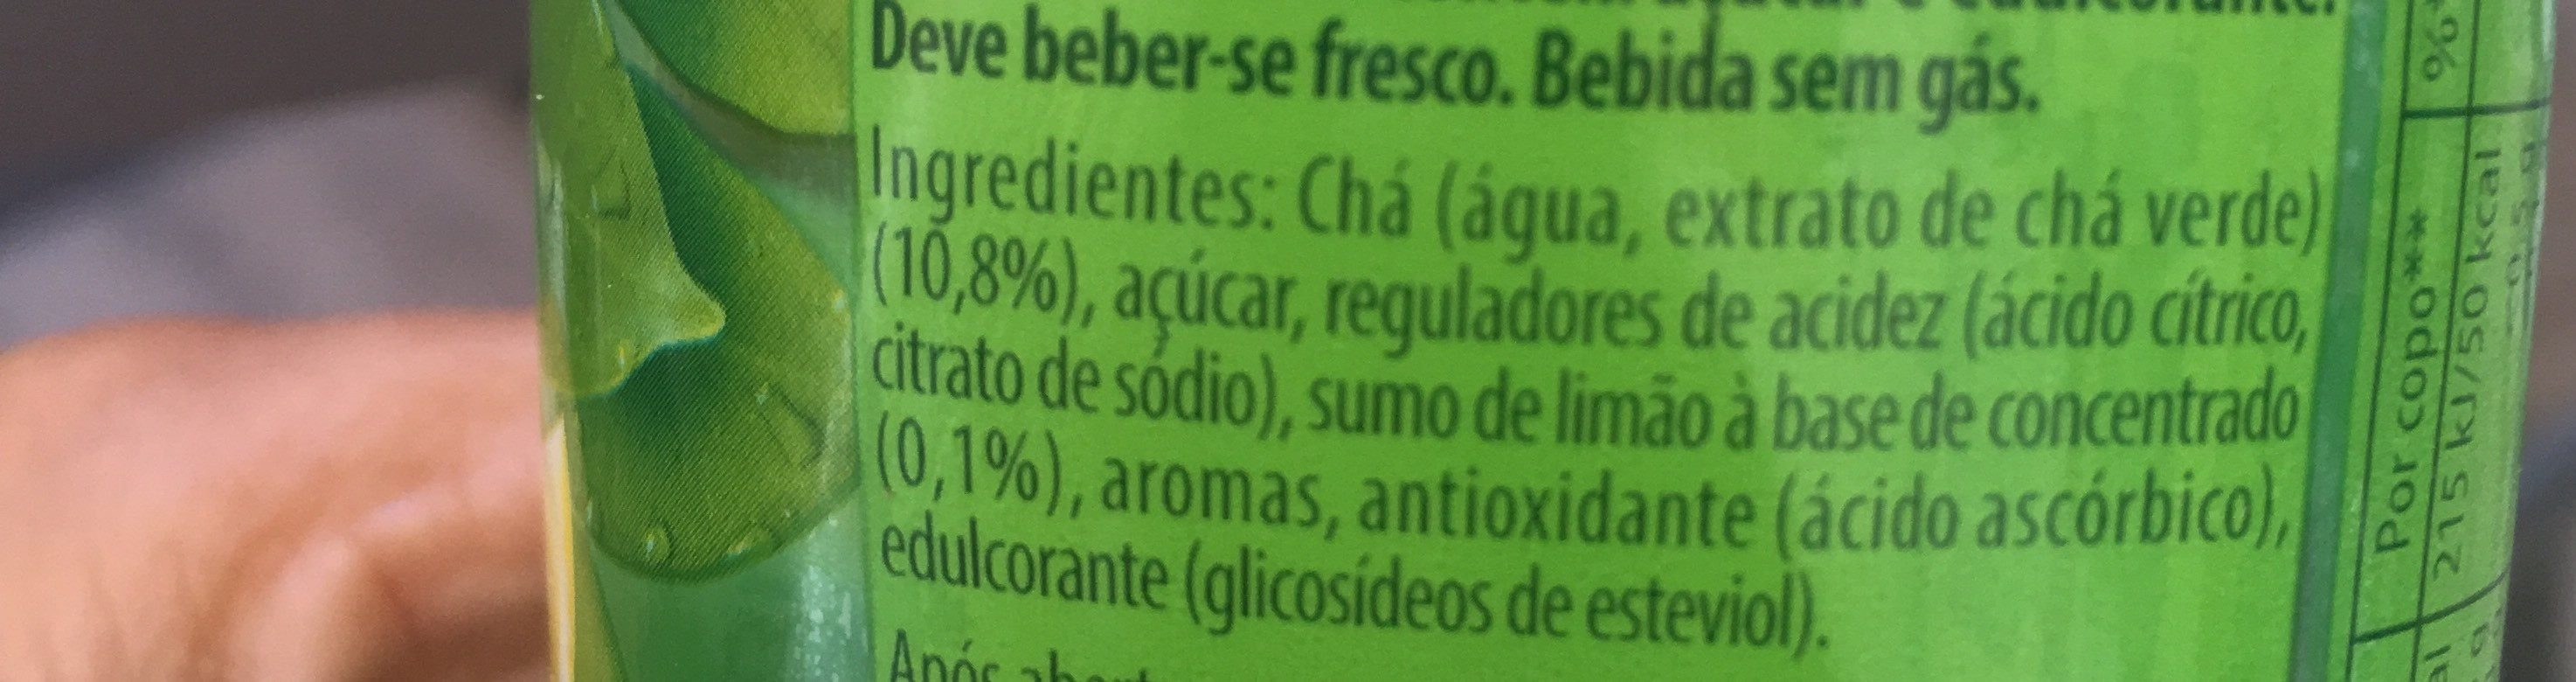 Cha verde limao - Ingredients - fr